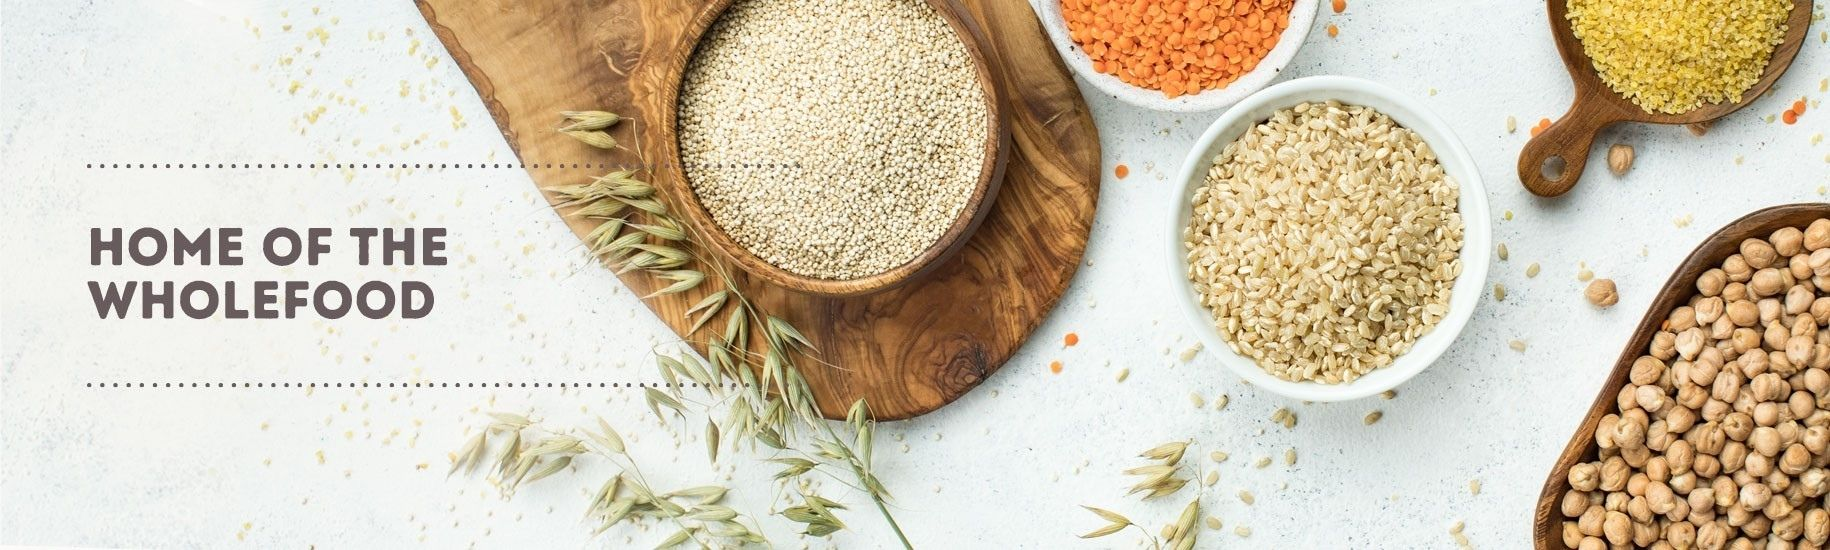 Nourish Pantry Essentials Wholefoods Banner